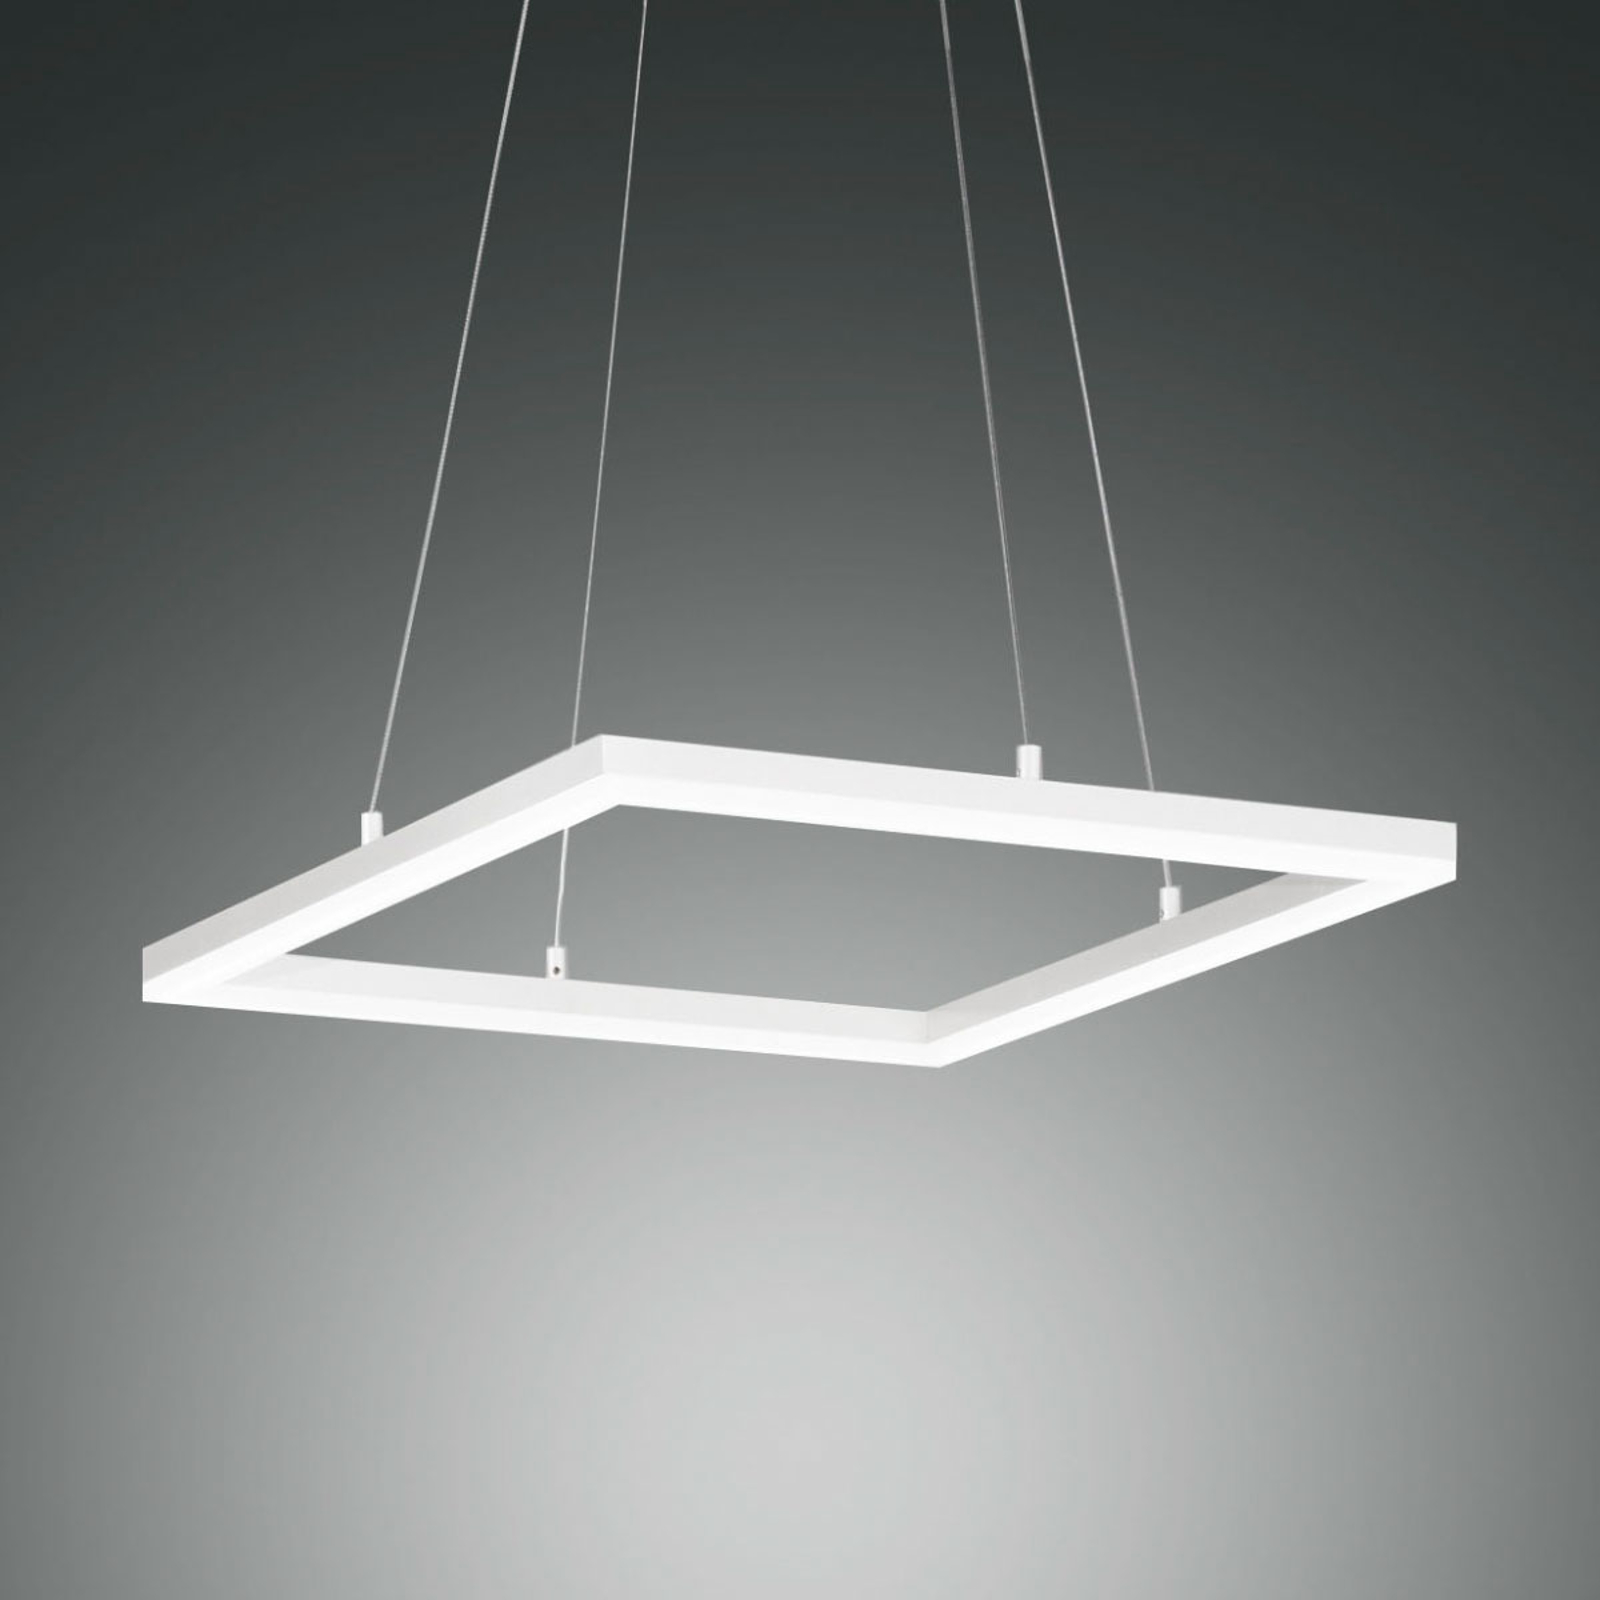 LED-Pendelleuchte Bard, 42x42cm in Weiß